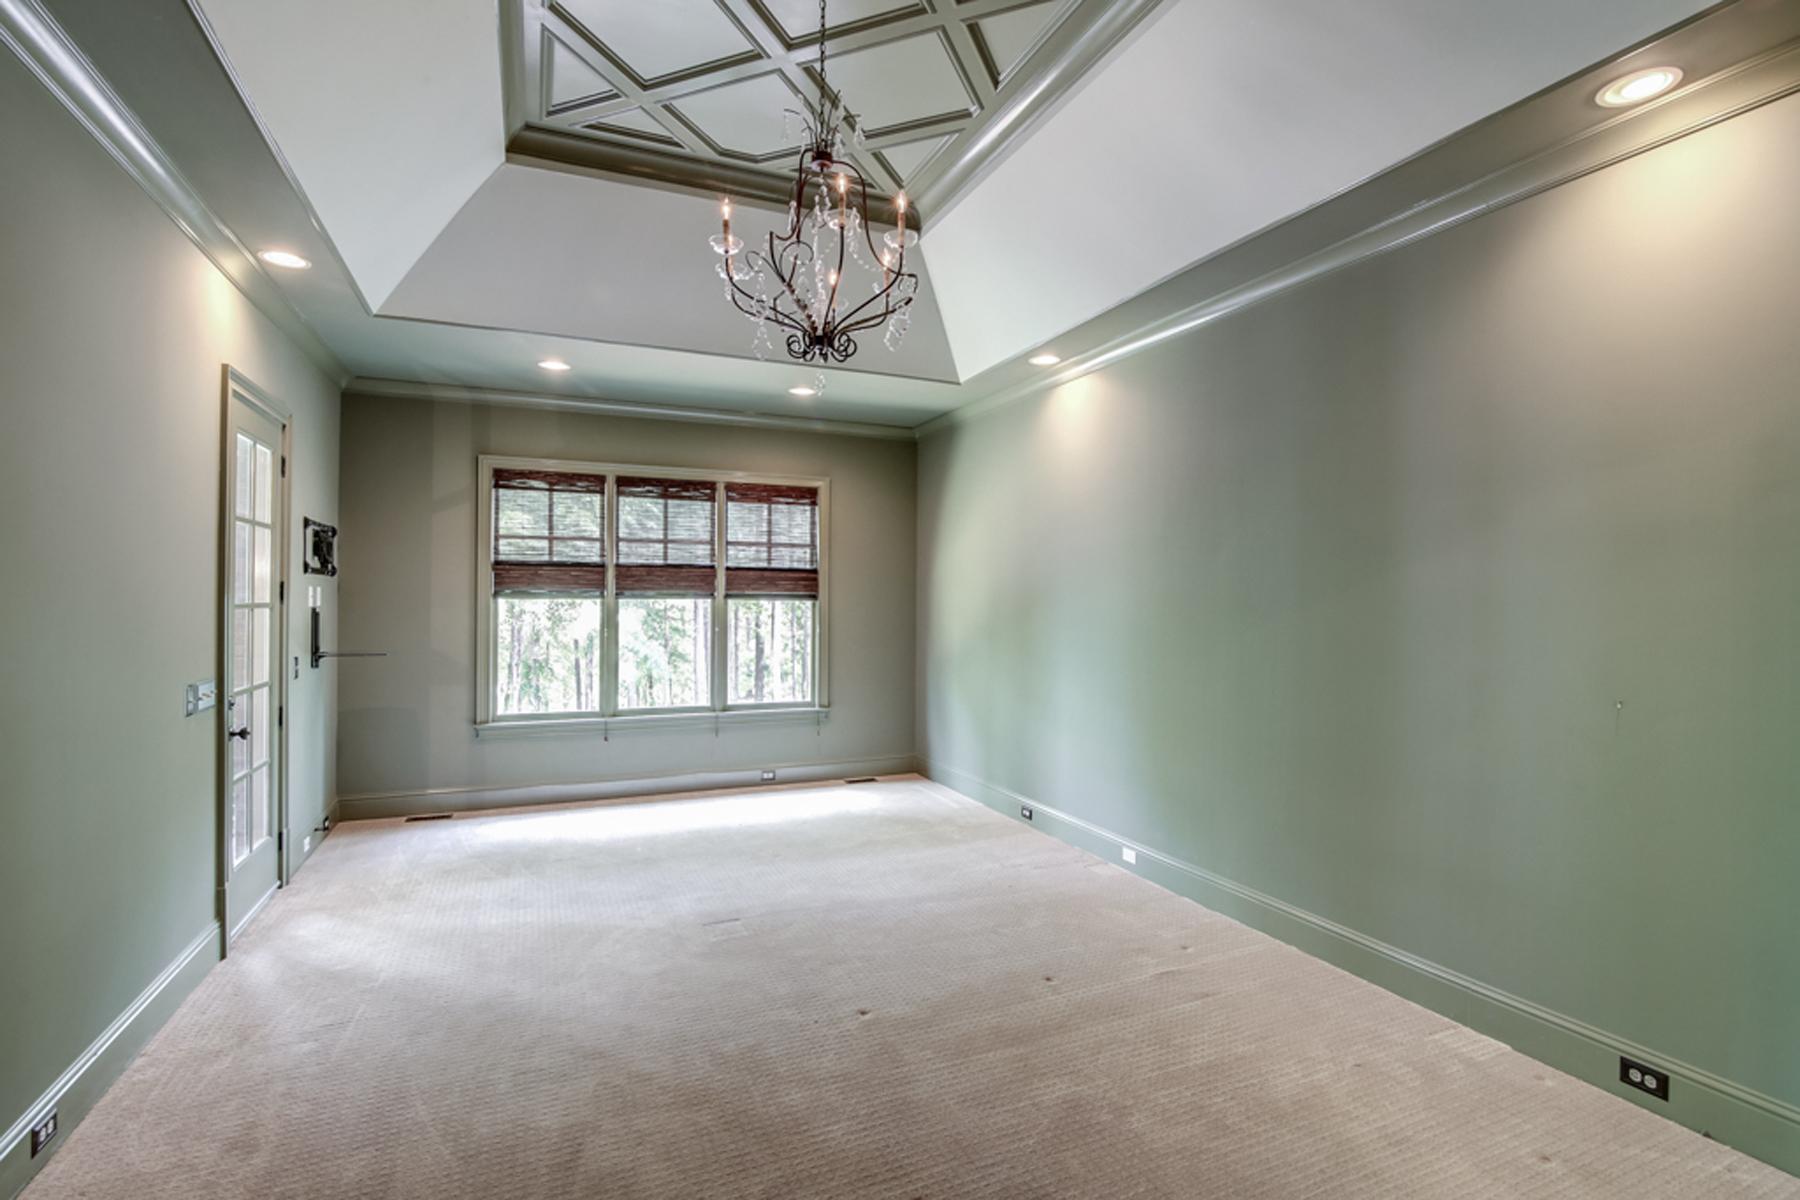 Additional photo for property listing at Immaculate With Master On Main 6062 Tattnall Overlook Acworth, Γεωργια 30101 Ηνωμενεσ Πολιτειεσ